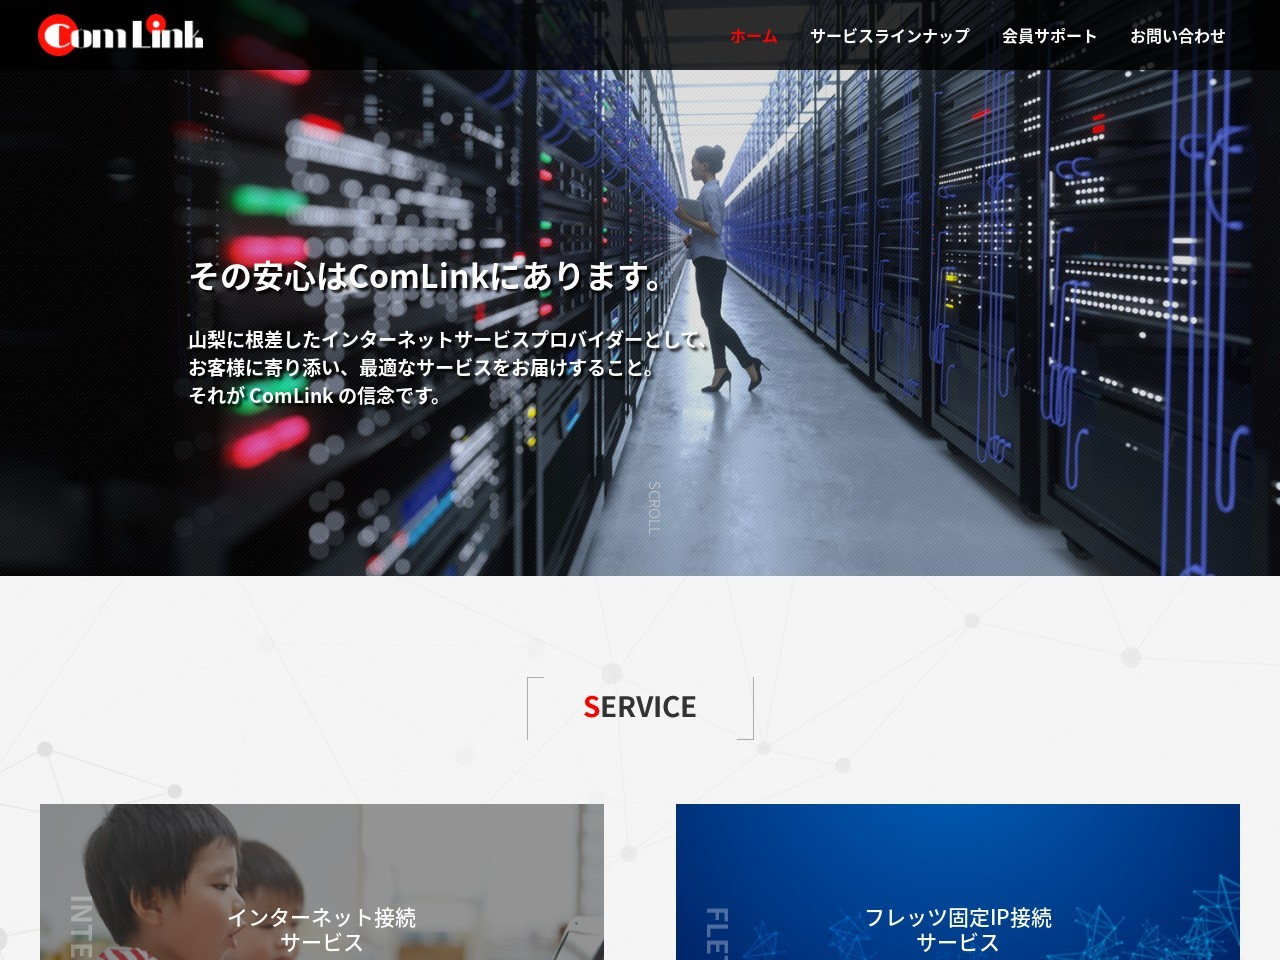 ComLink Internet|コムリンクインターネット 株式会社ウインテックコミュニケーションズ